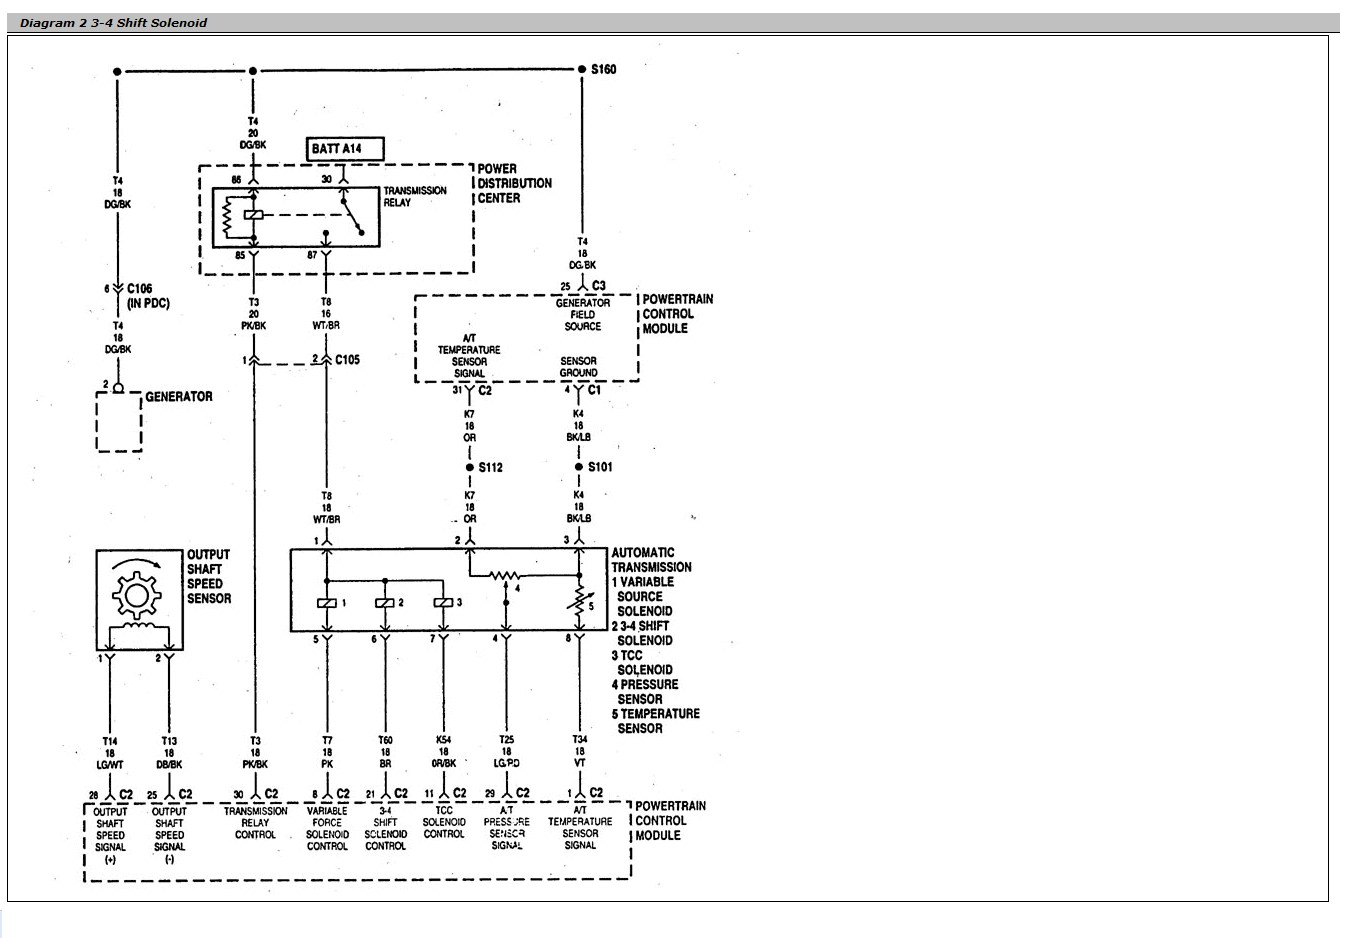 Wiring Diagram For 2001 Ferrari 360 Diagrams Ninja Engine Schematic Kawasaki